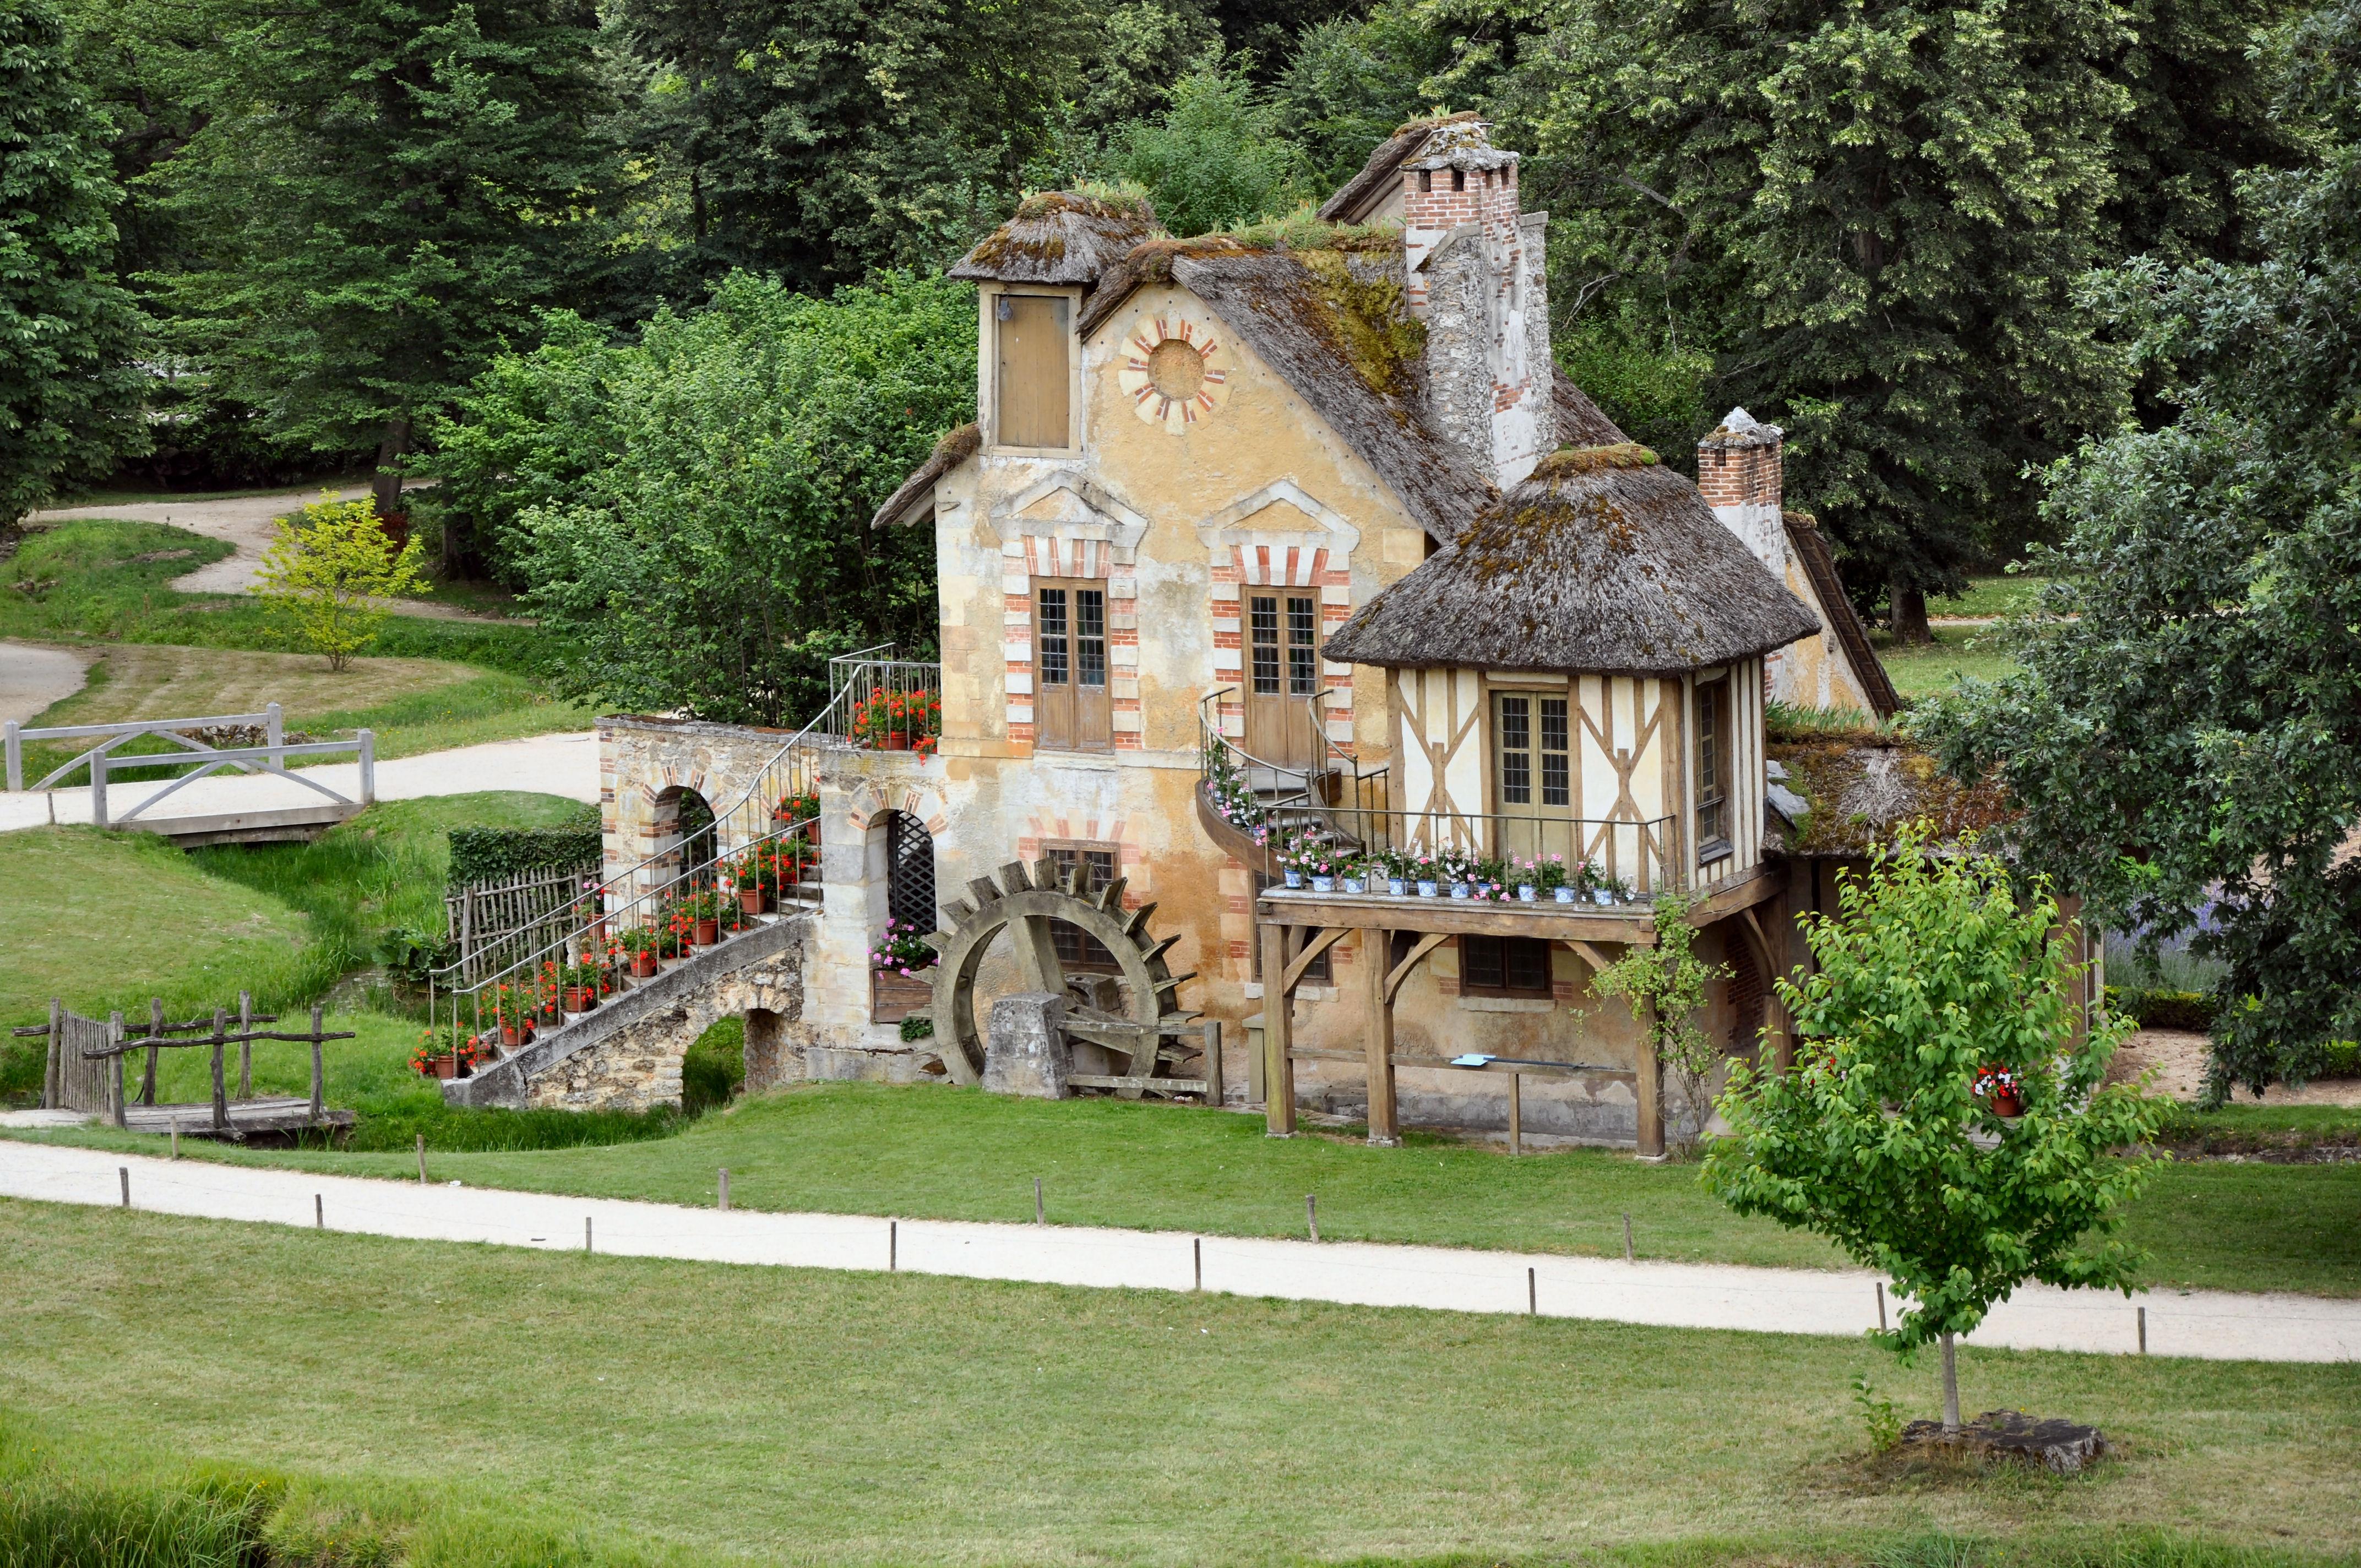 File:Moulin au Hameau de la Reine (1).jpg - Wikimedia Commons